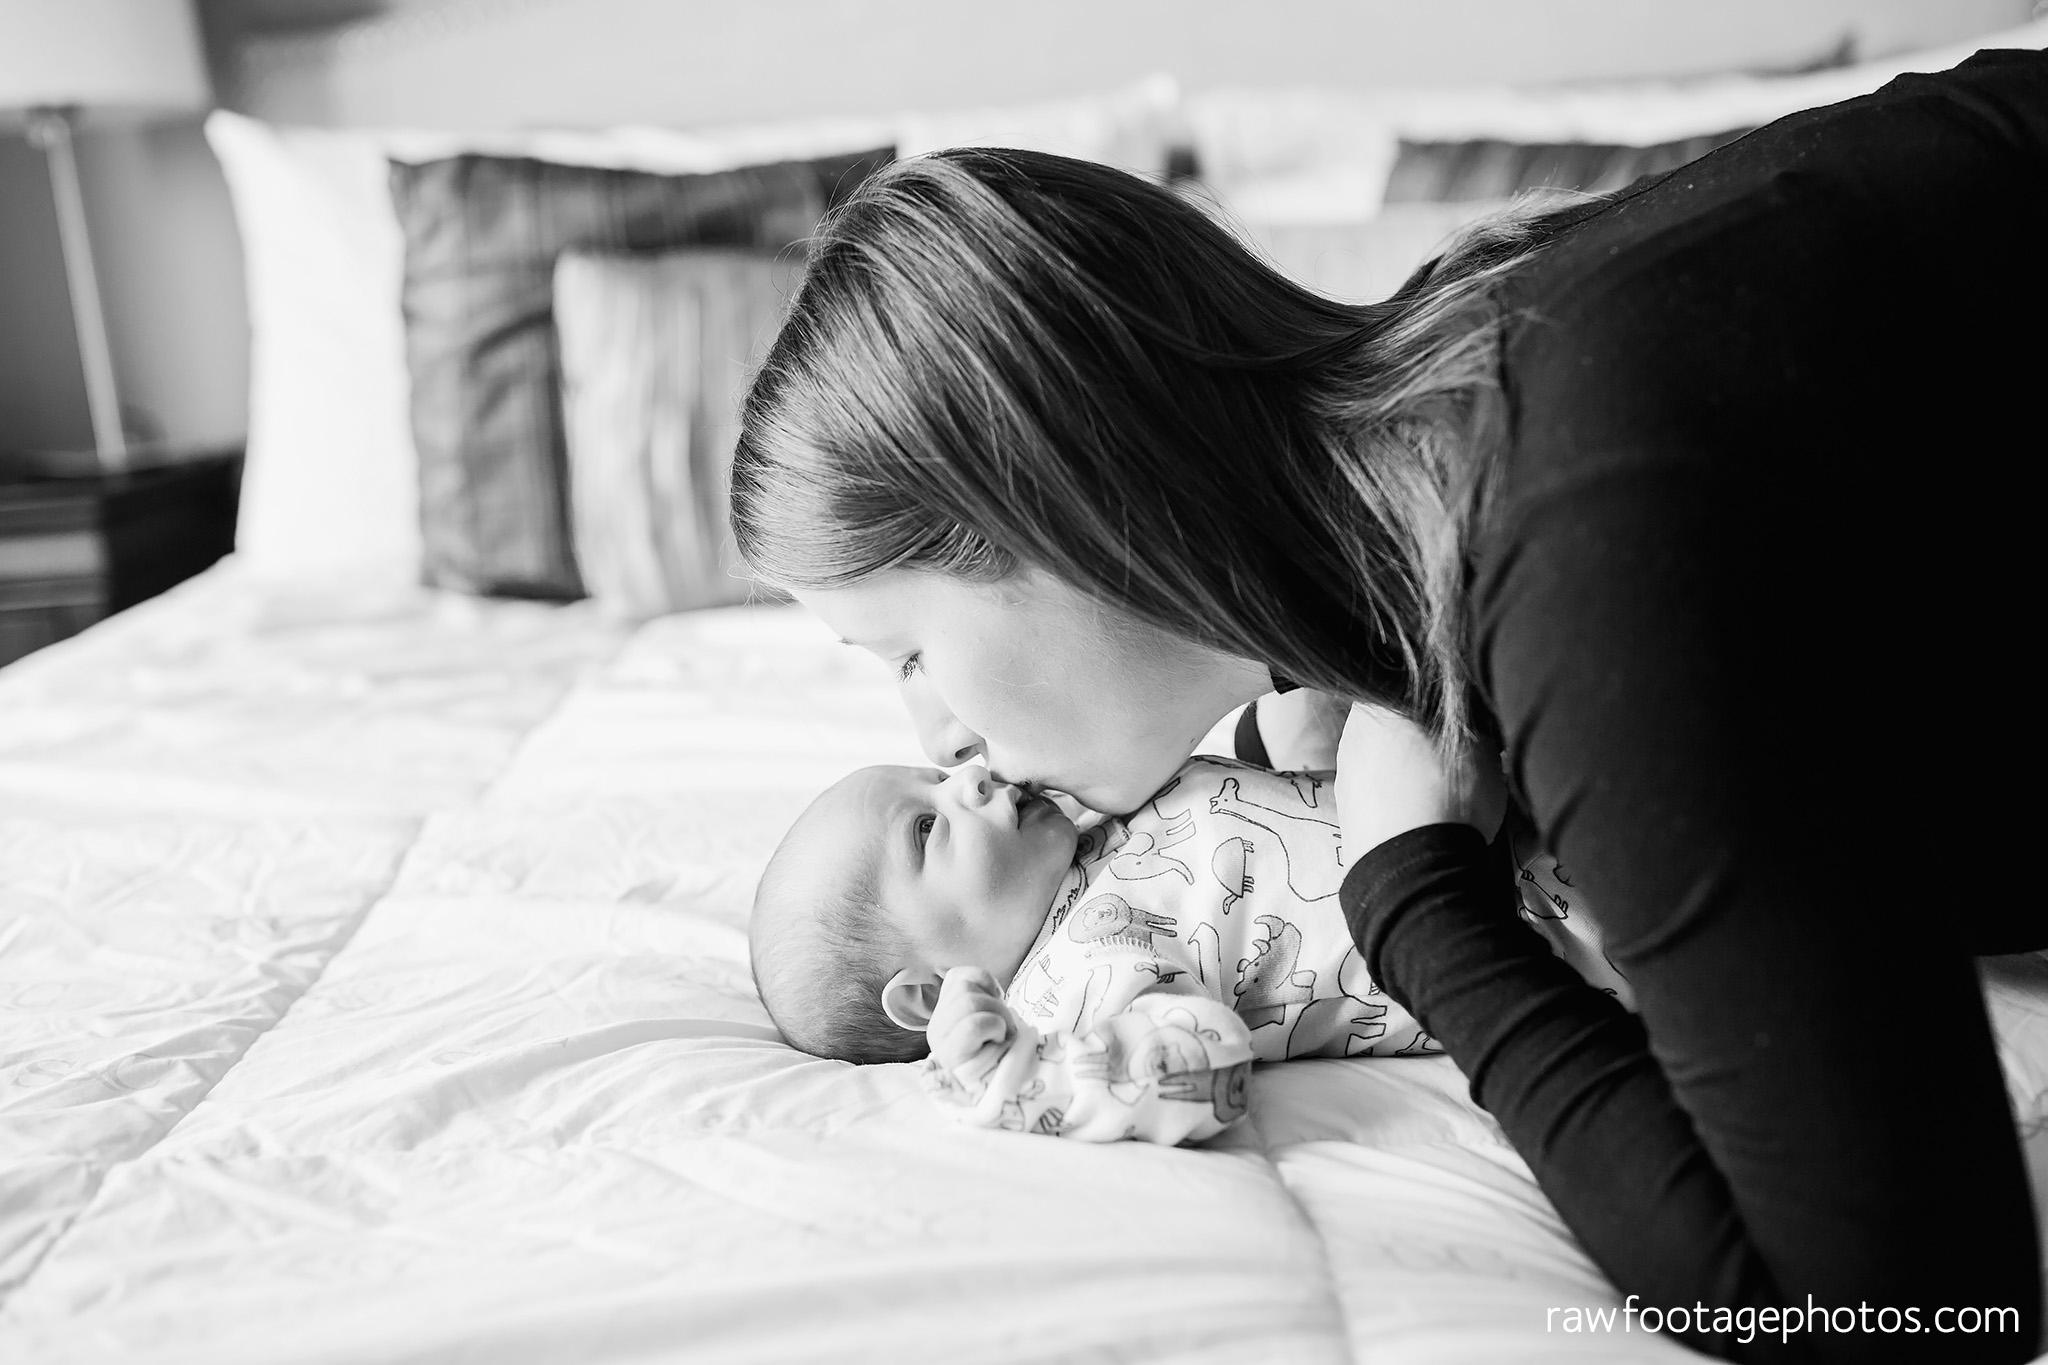 london_ontario_newborn_lifestyle_photographer-baby_nate-raw_footage_photography012.jpg